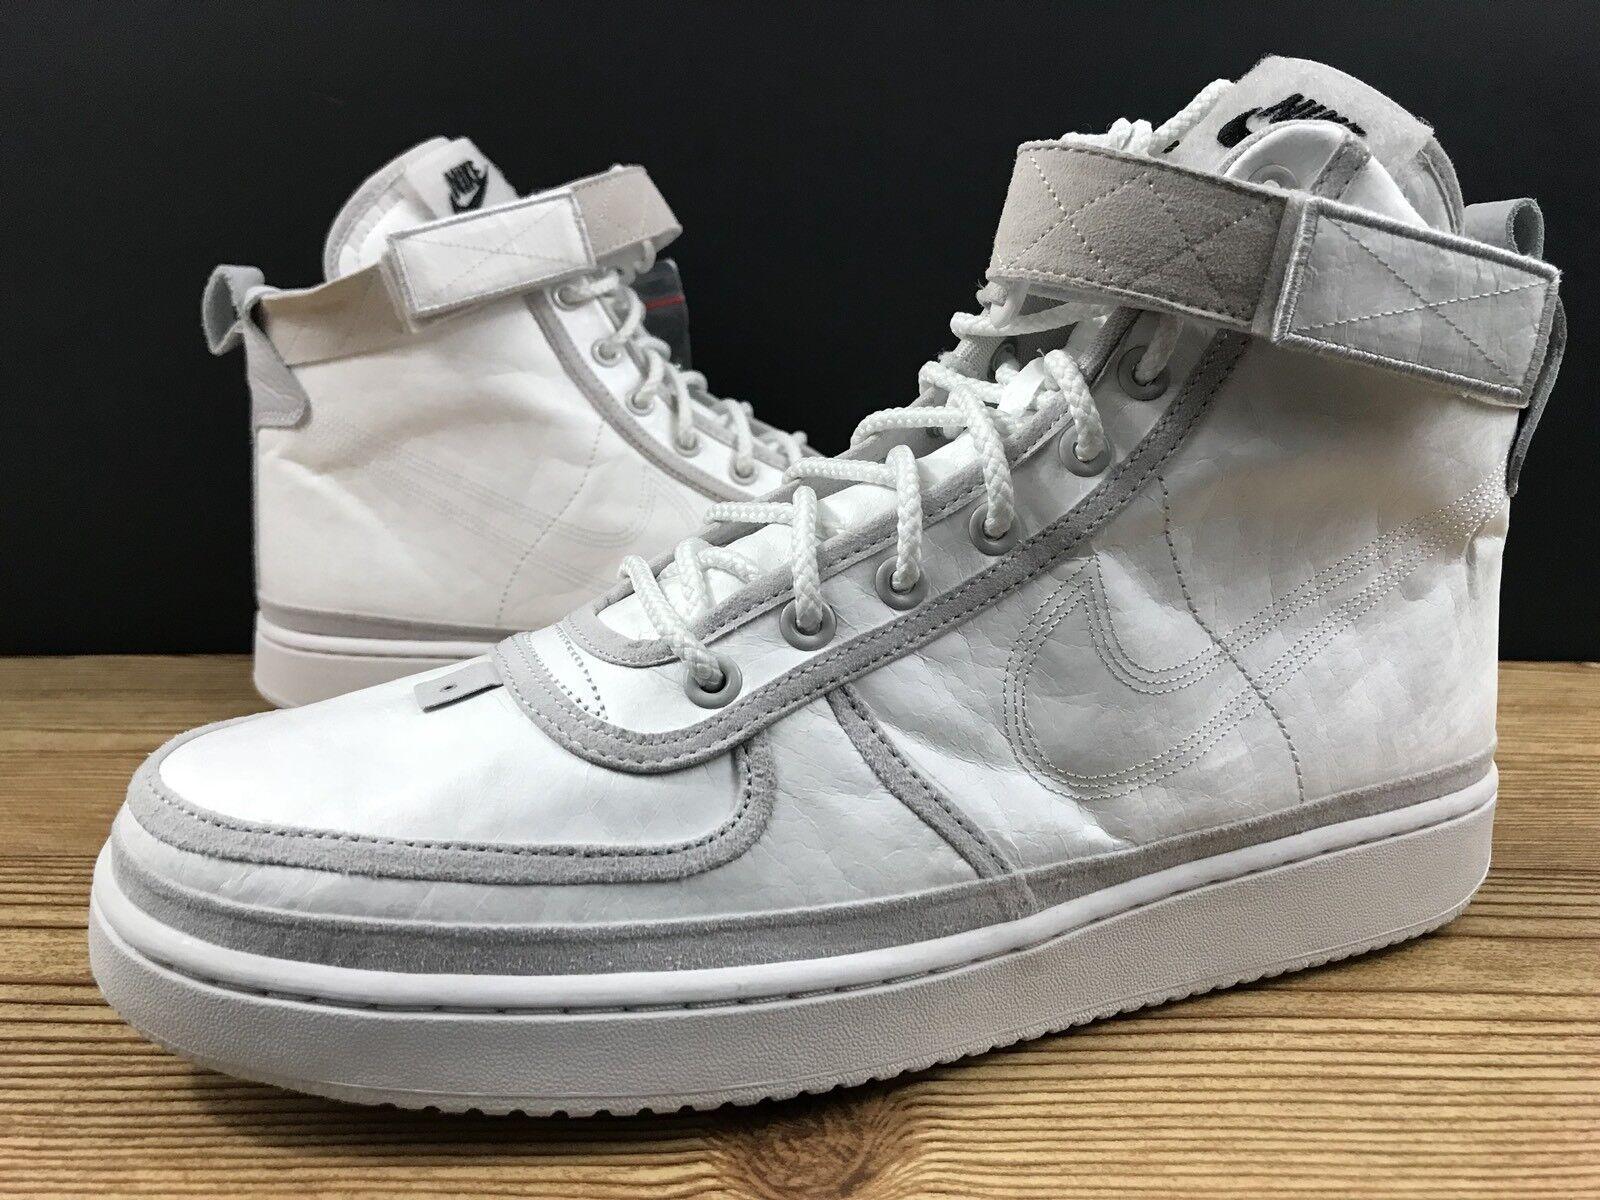 Nike Vandal High Supreme AS All-Star QS Customizable SZ 11 AQ0113-001